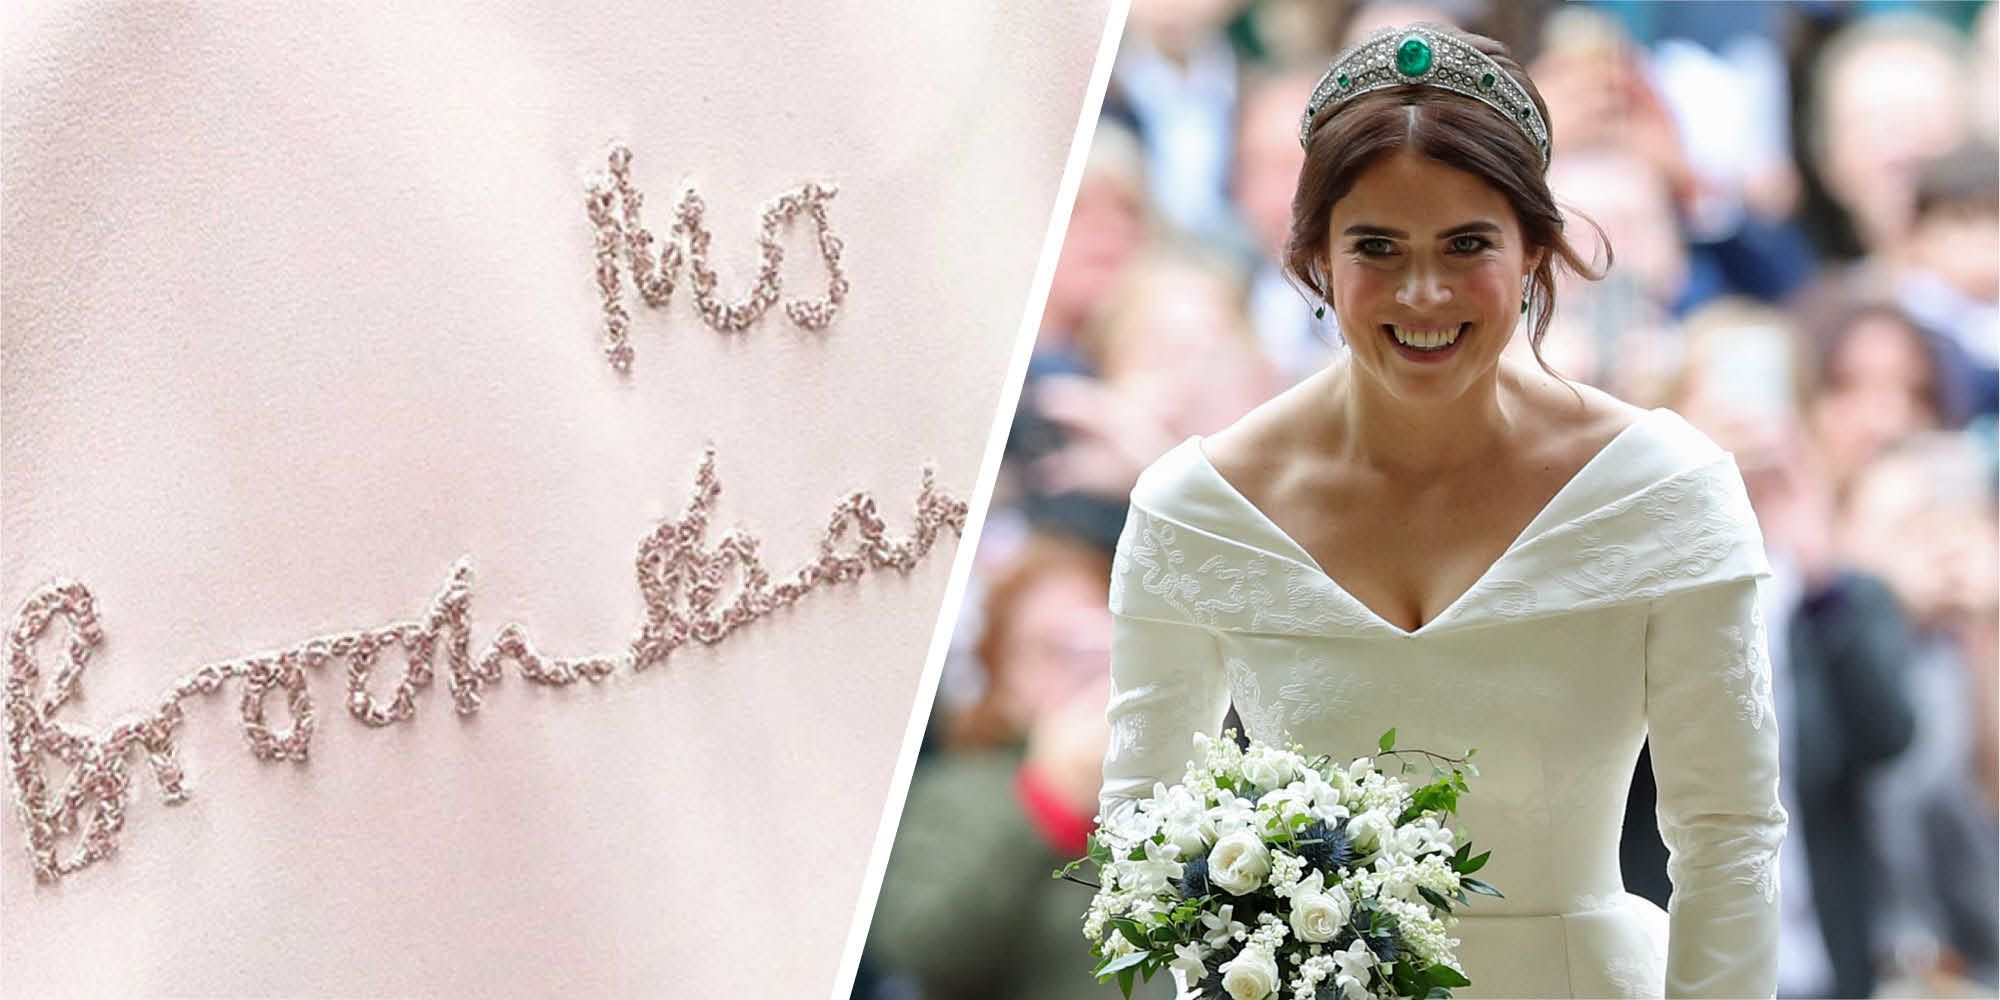 Eugenie Wedding Dress.Princess Eugenie Third Wedding Dress The Princess Broke Royal